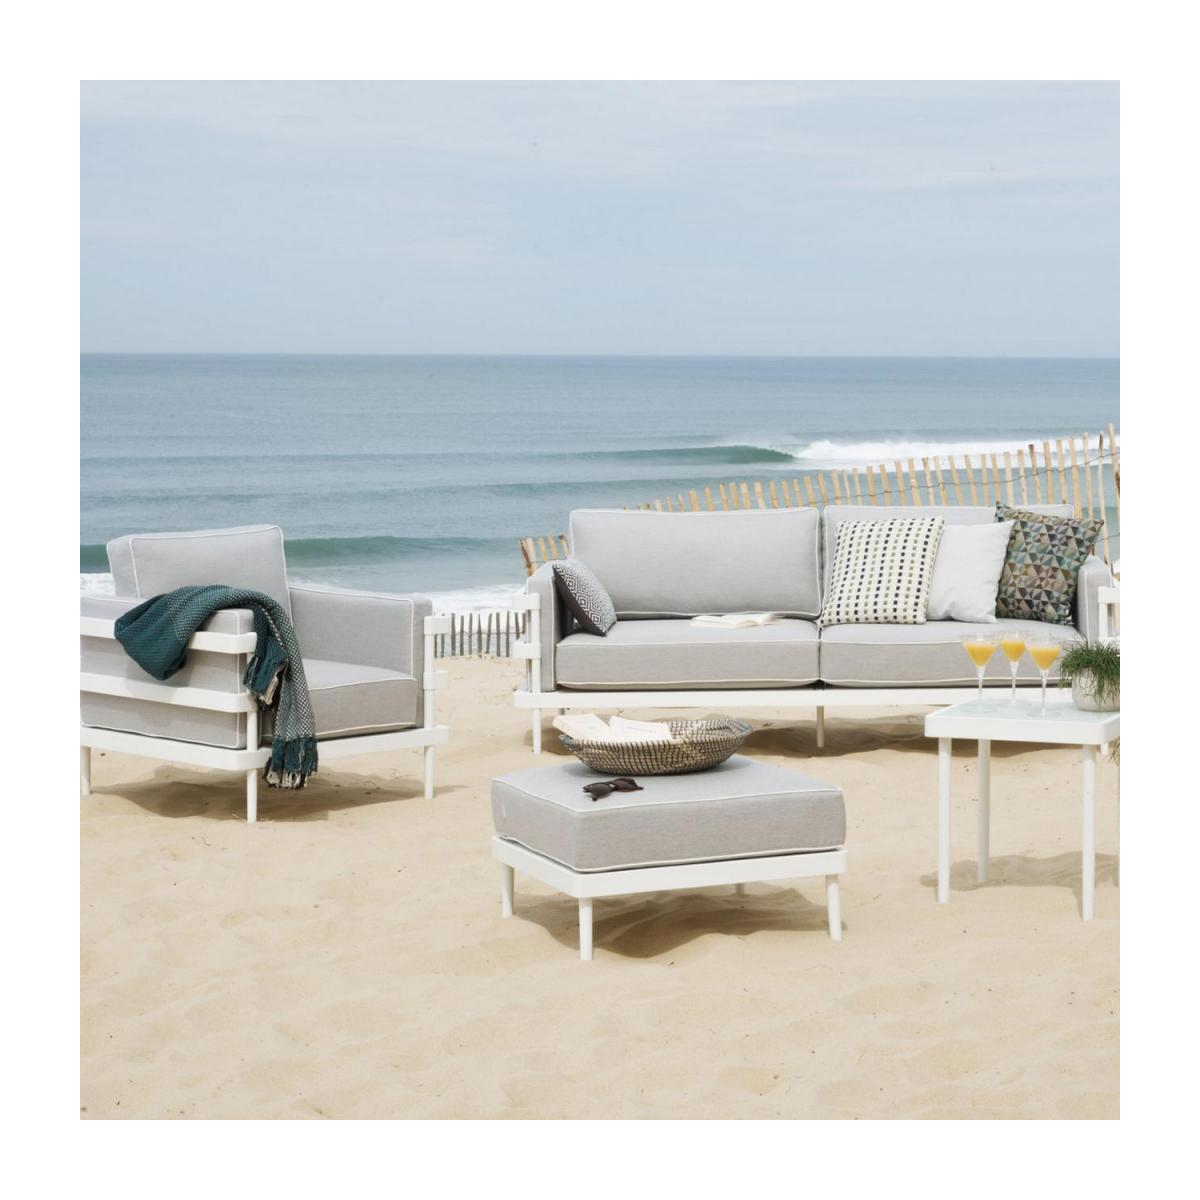 Canapé De Jardin En Aluminium Avec Coussins Sunbrella - Blanc intérieur Canape Jardin Aluminium